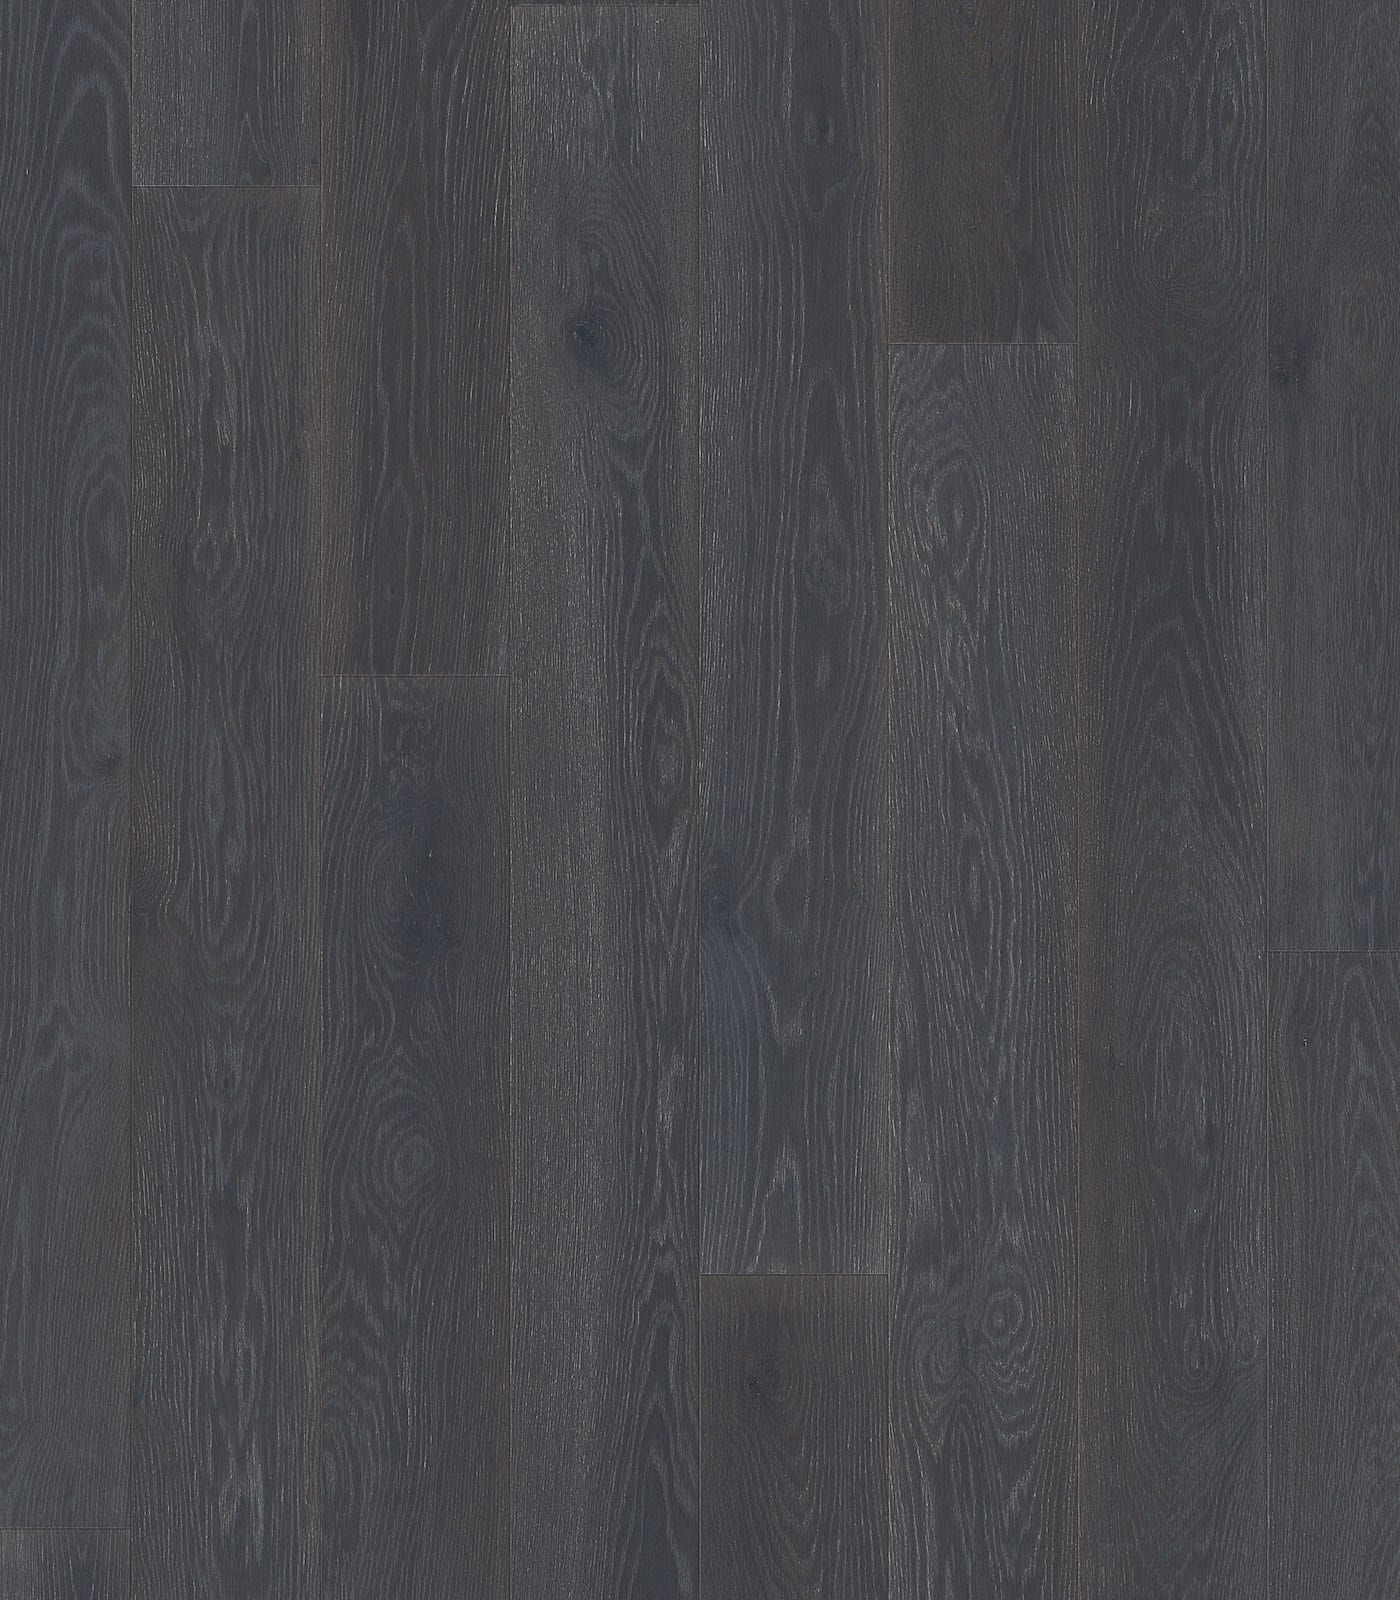 Obsidian-Floors European Oak-Colors Collection